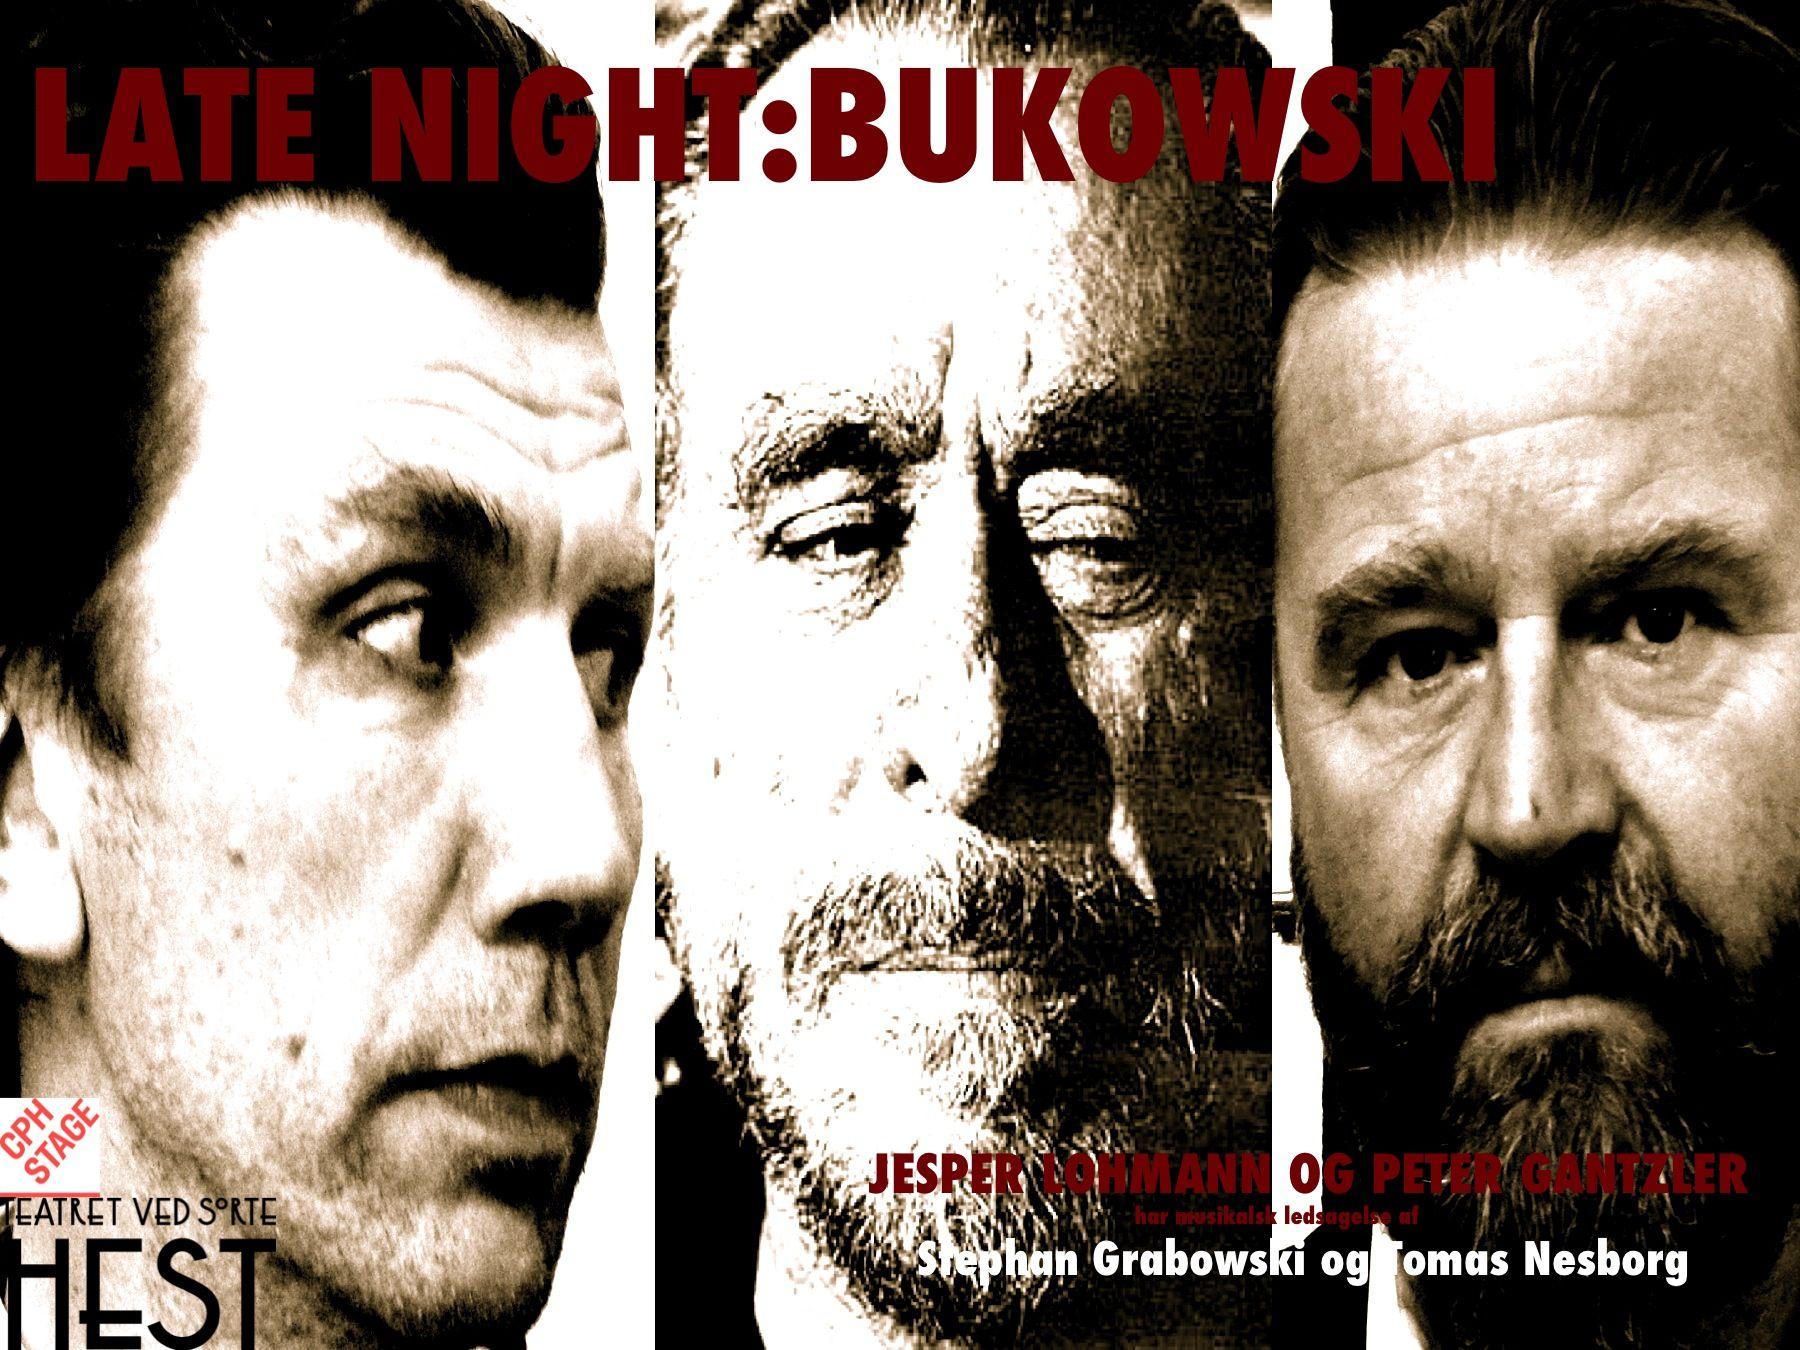 LATE NIGHT: BUKOWSKI